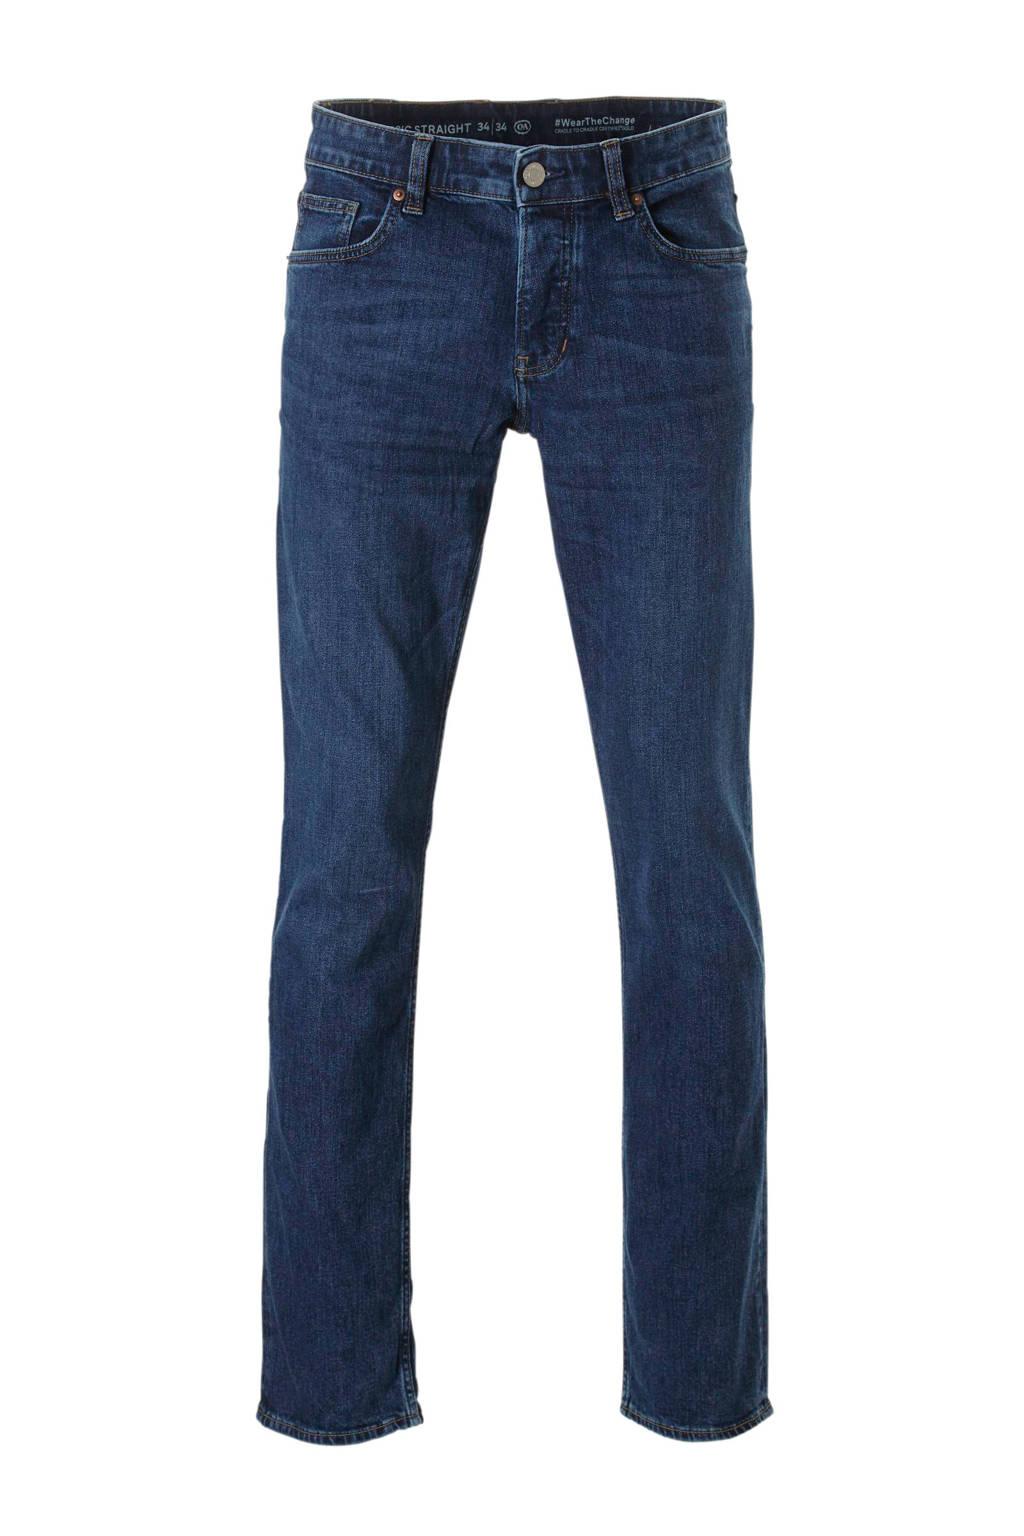 C&A The Denim  straight straight fit jeans, Dark denim